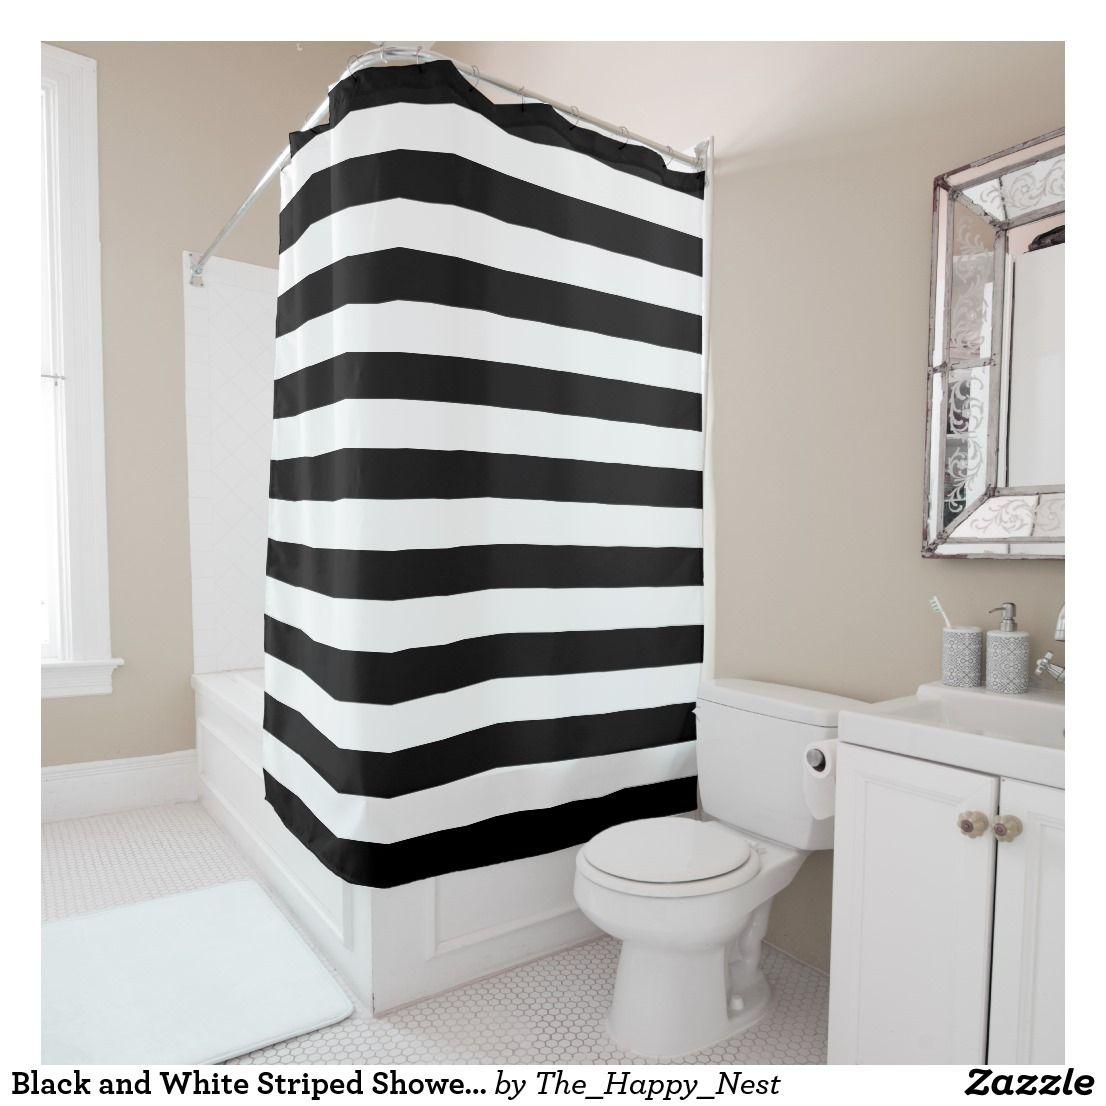 Black And White Striped Shower Curtain Zazzle Com In 2019 Home